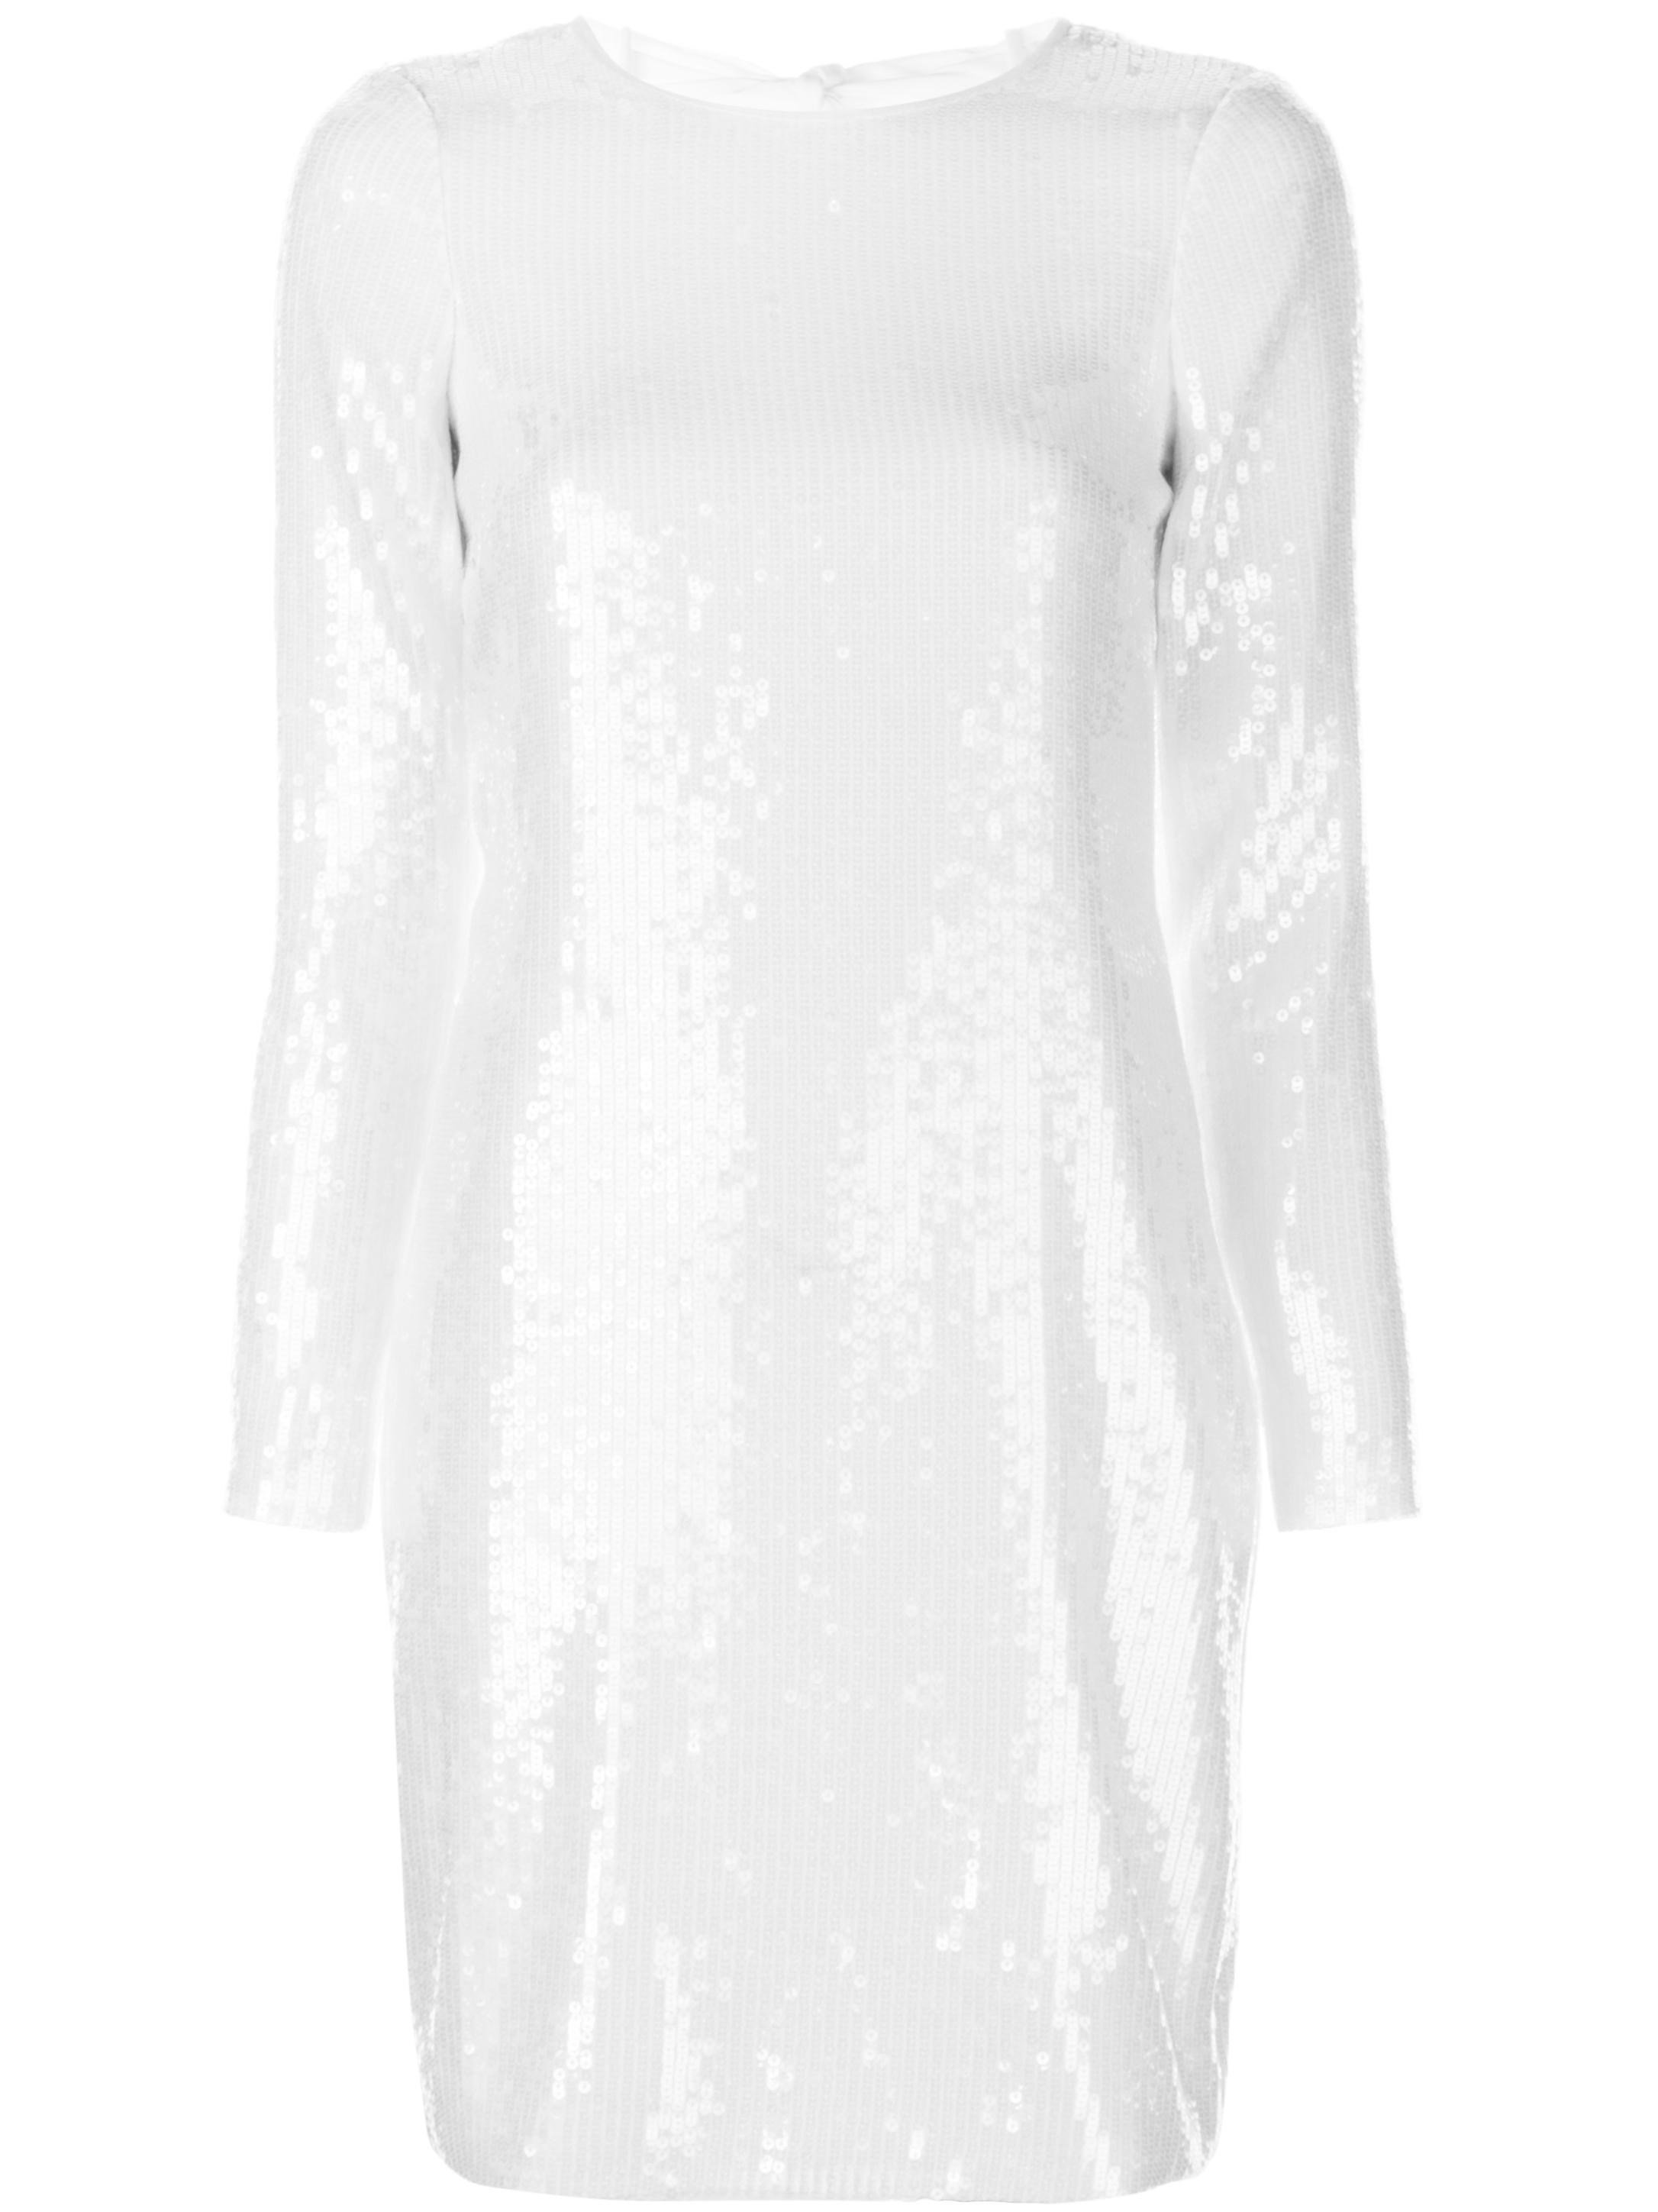 Sequin Long Sleeve Tie Back Mini Dress Item # LW130